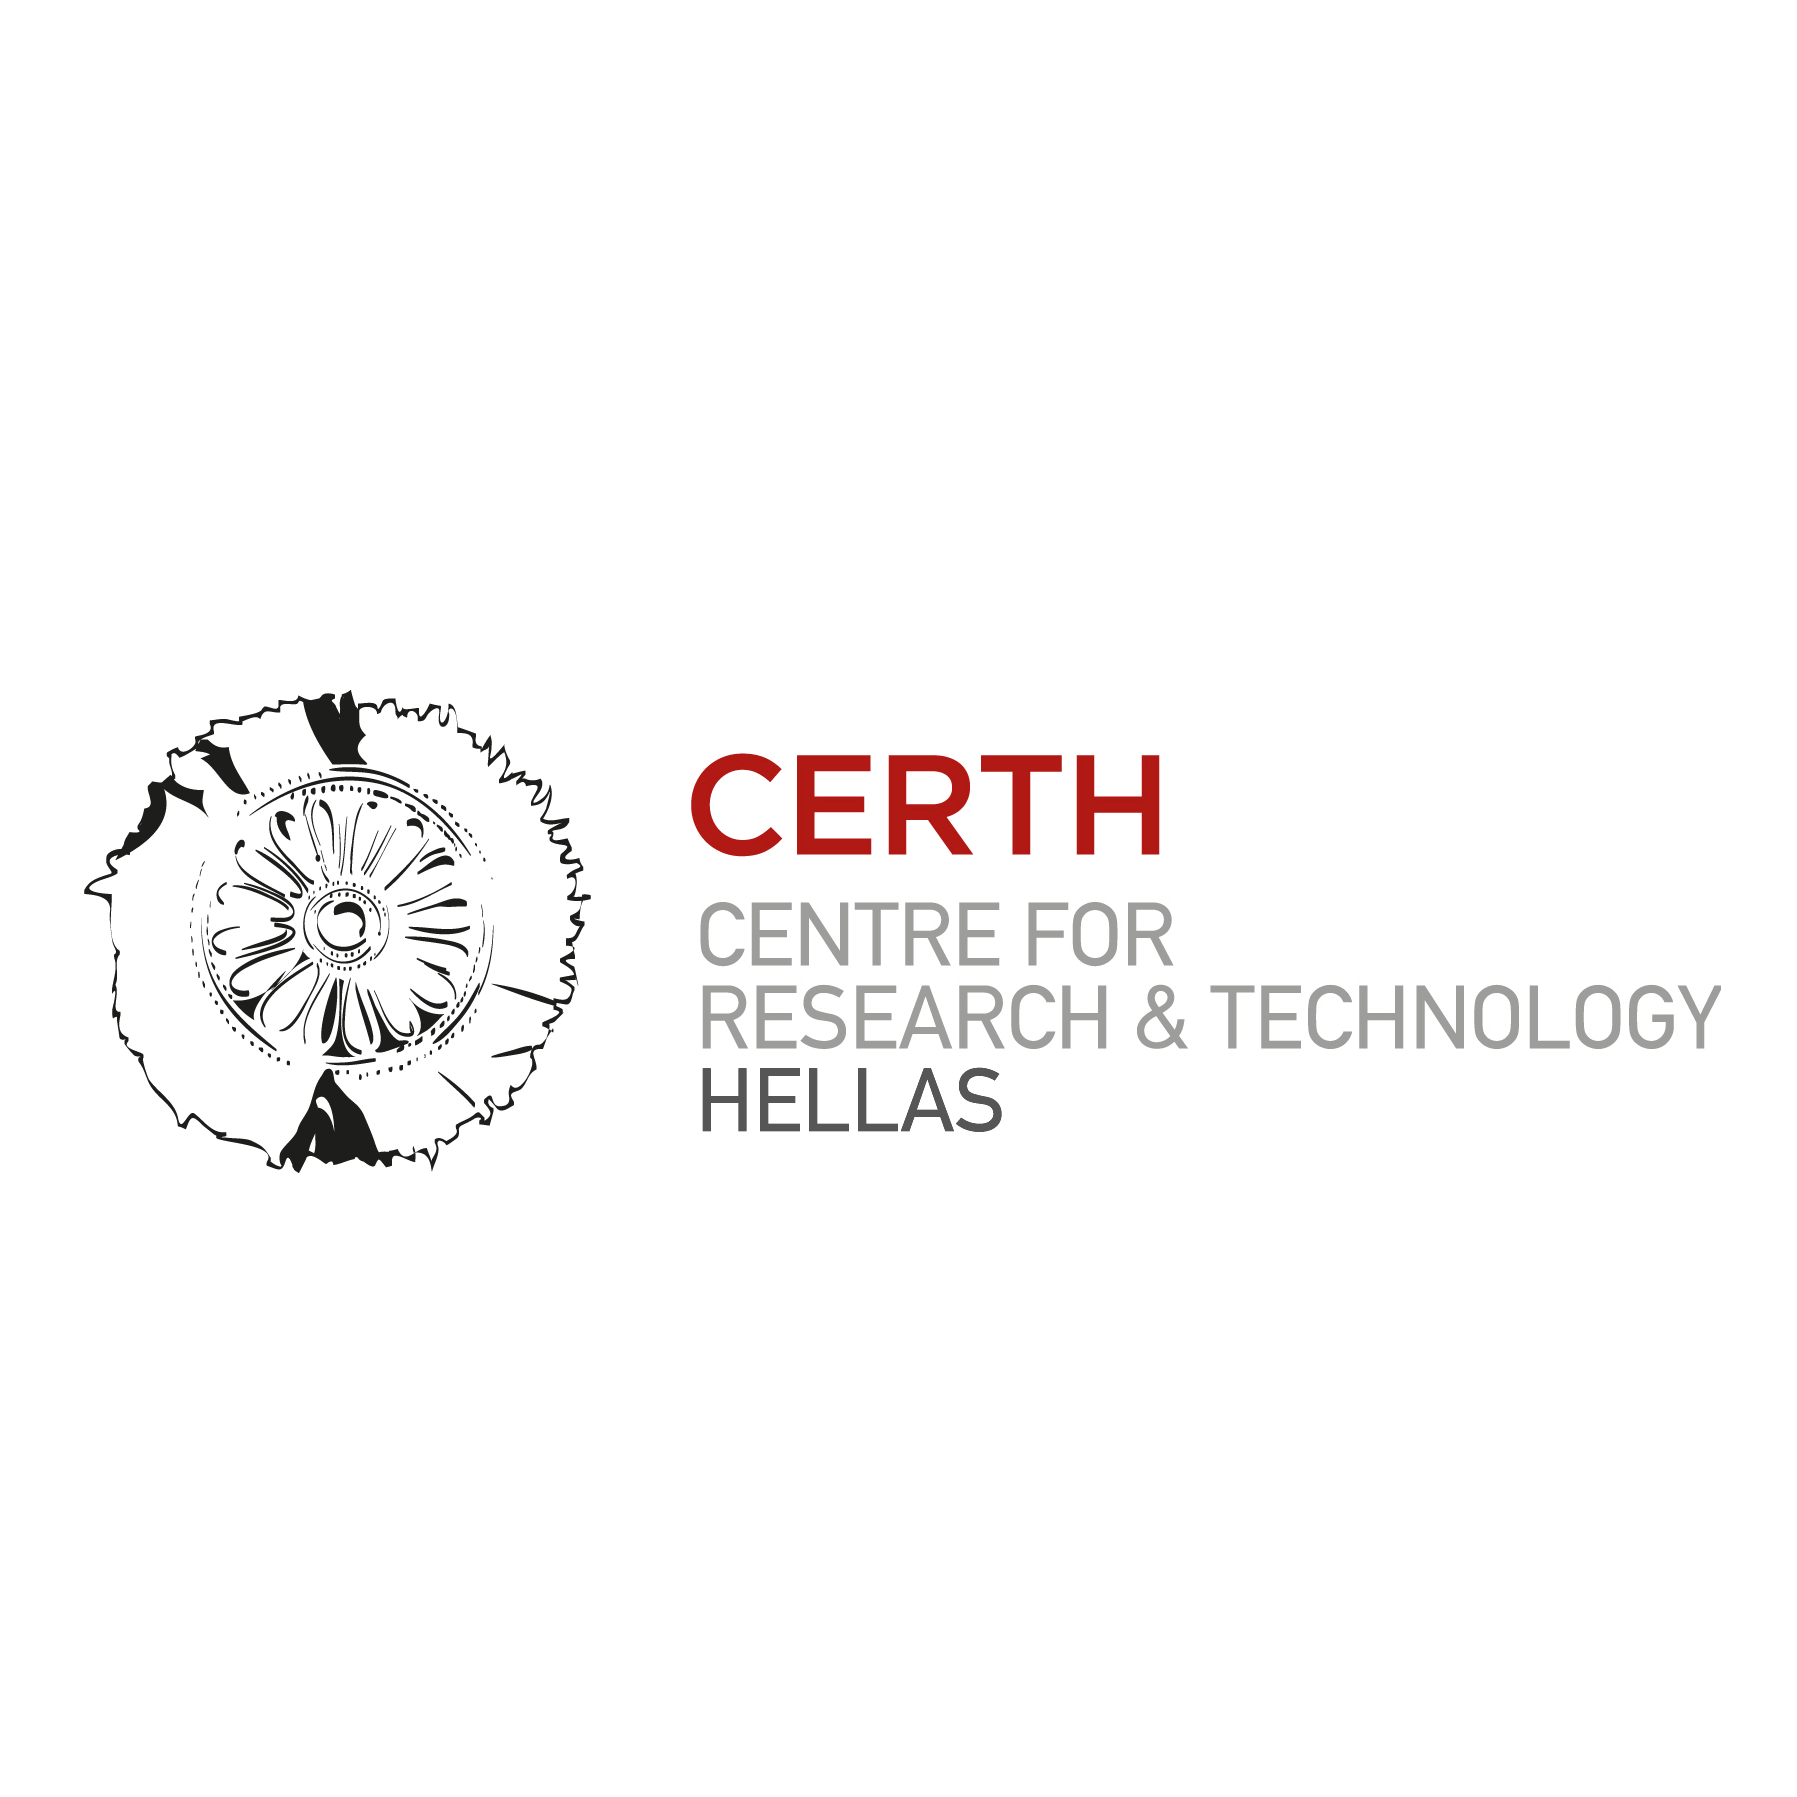 CERTH-logo